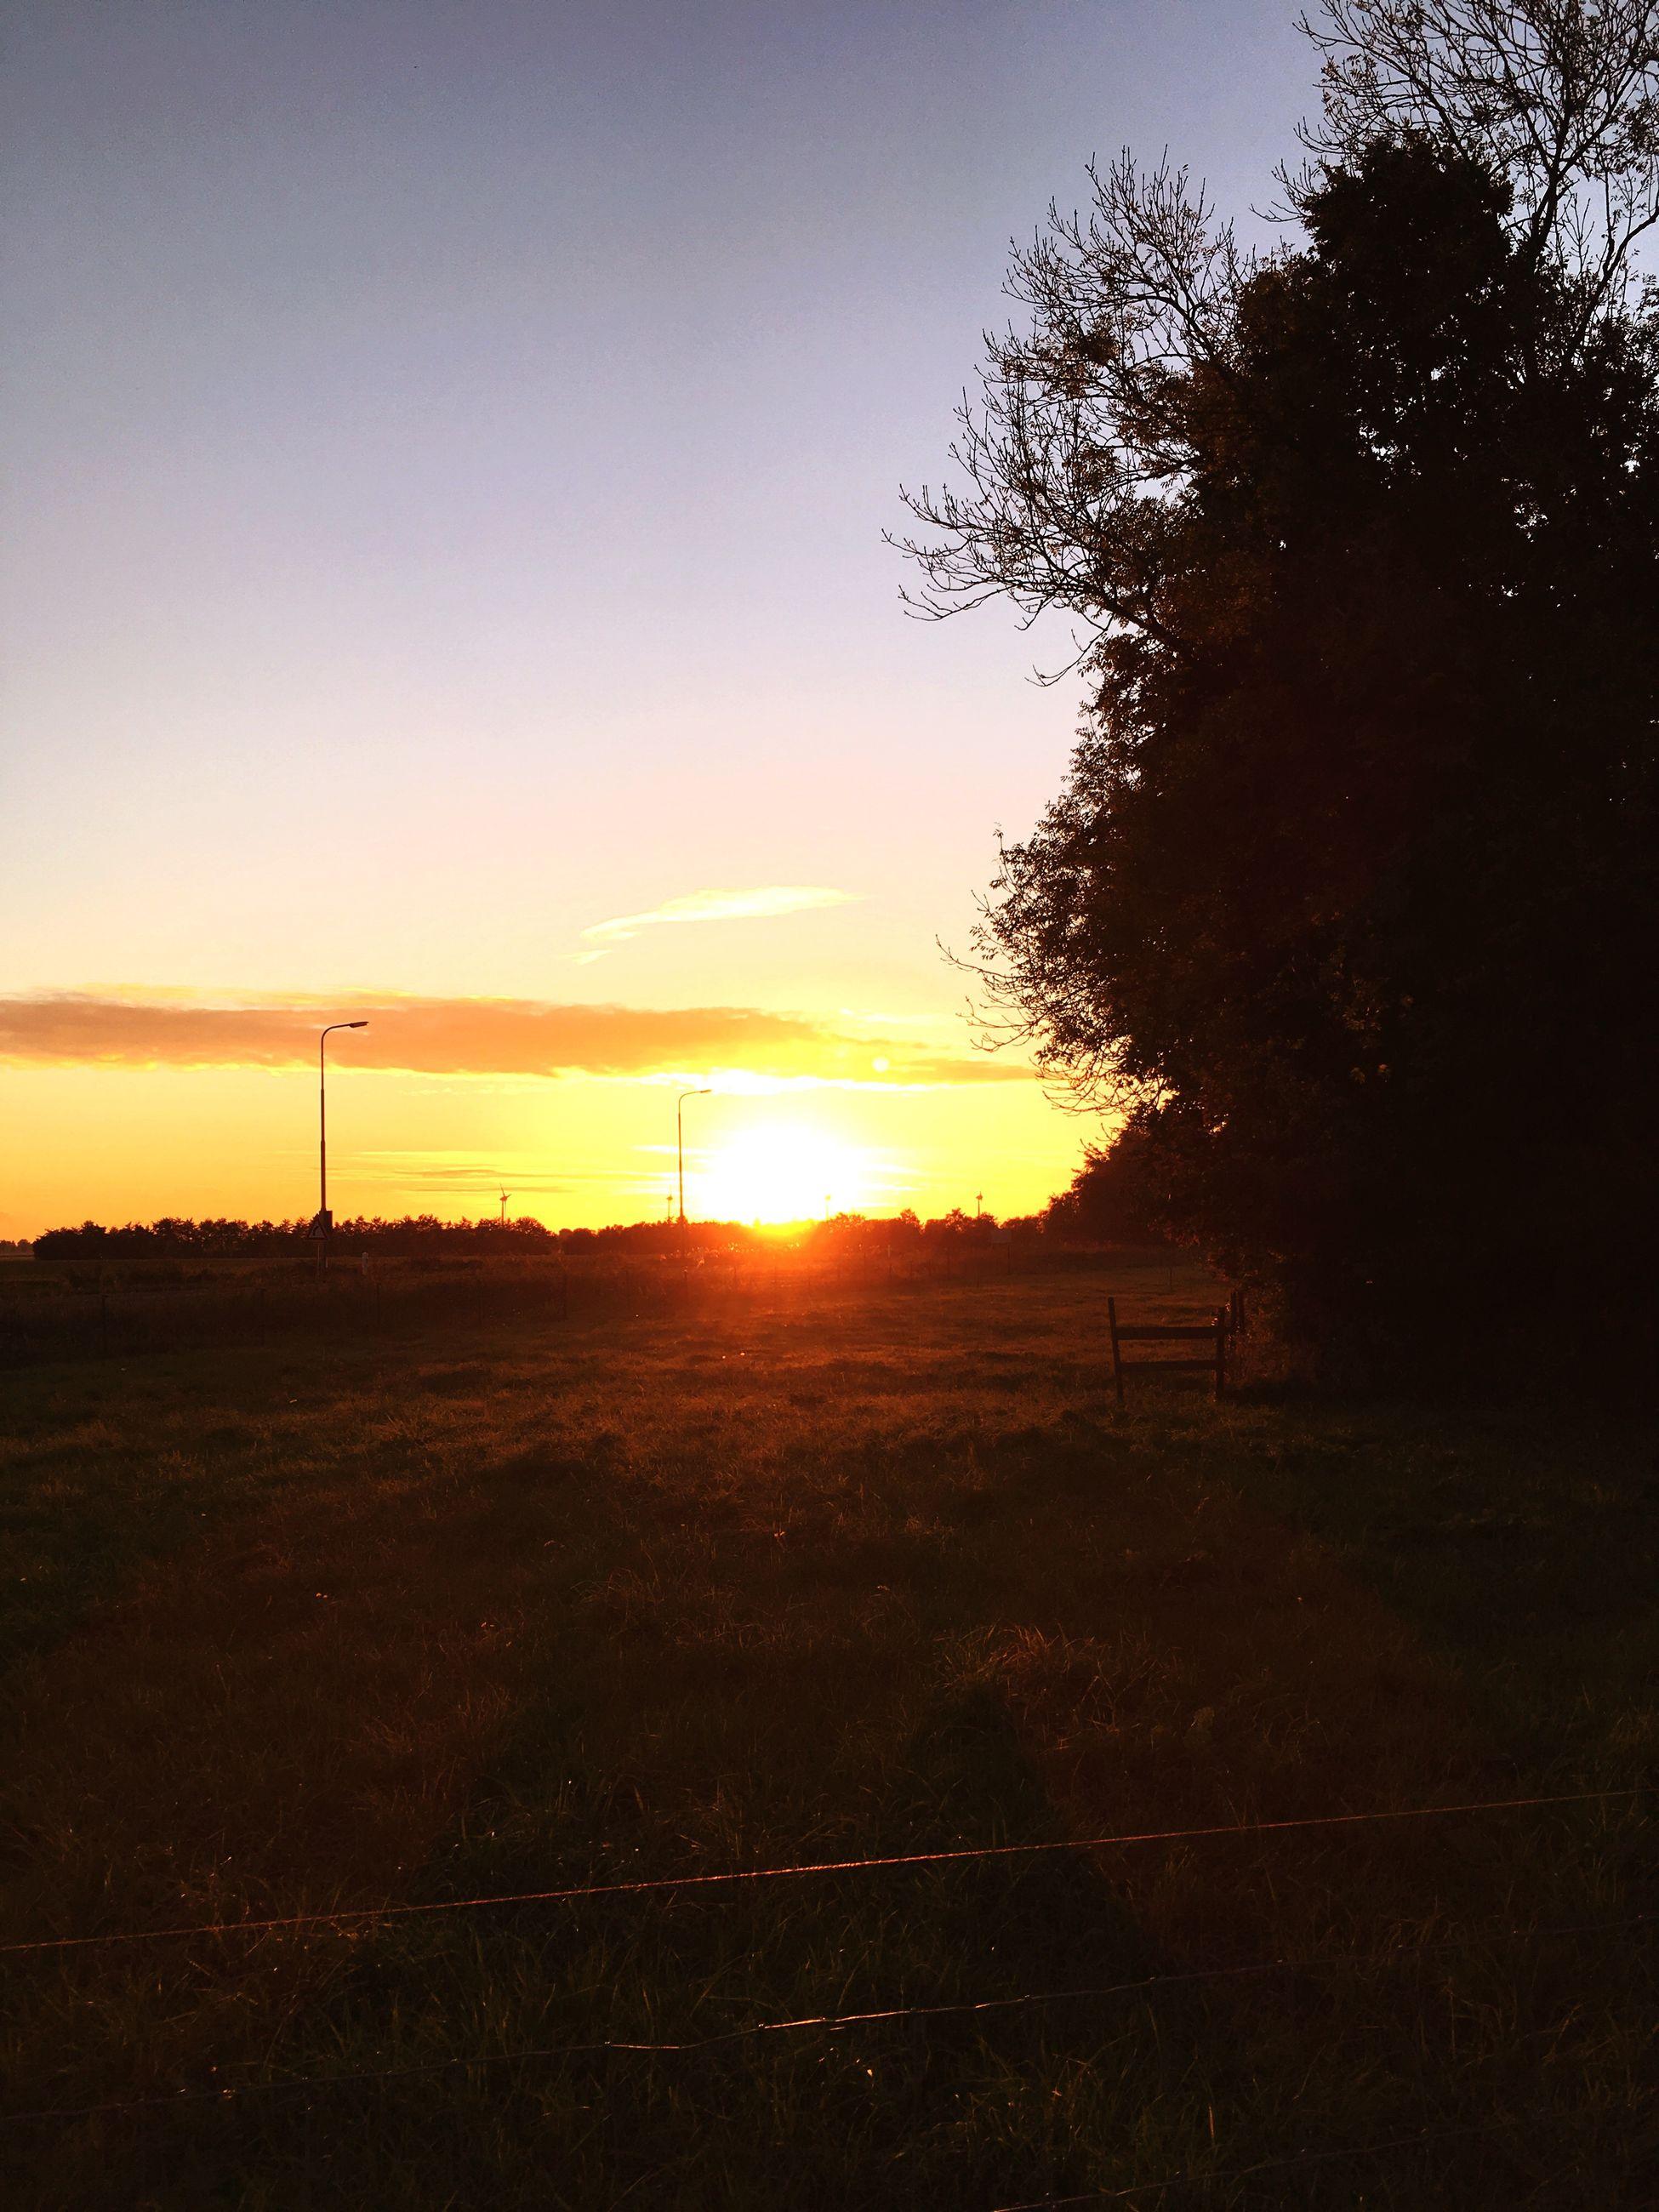 sunset, sun, tranquil scene, tree, landscape, orange color, tranquility, silhouette, scenics, sky, beauty in nature, idyllic, dark, nature, field, outdoors, remote, cloud, solitude, outline, calm, no people, non-urban scene, countryside